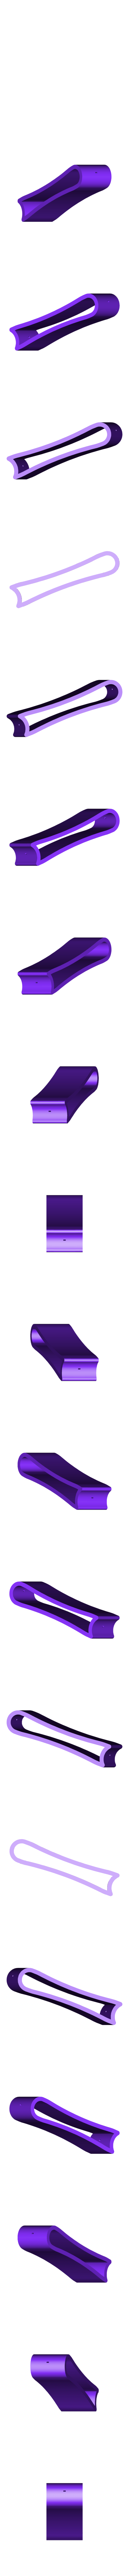 C6_X1.stl Download STL file Adjustable lamp - with vertebrae  • 3D printable object, Ciokobango